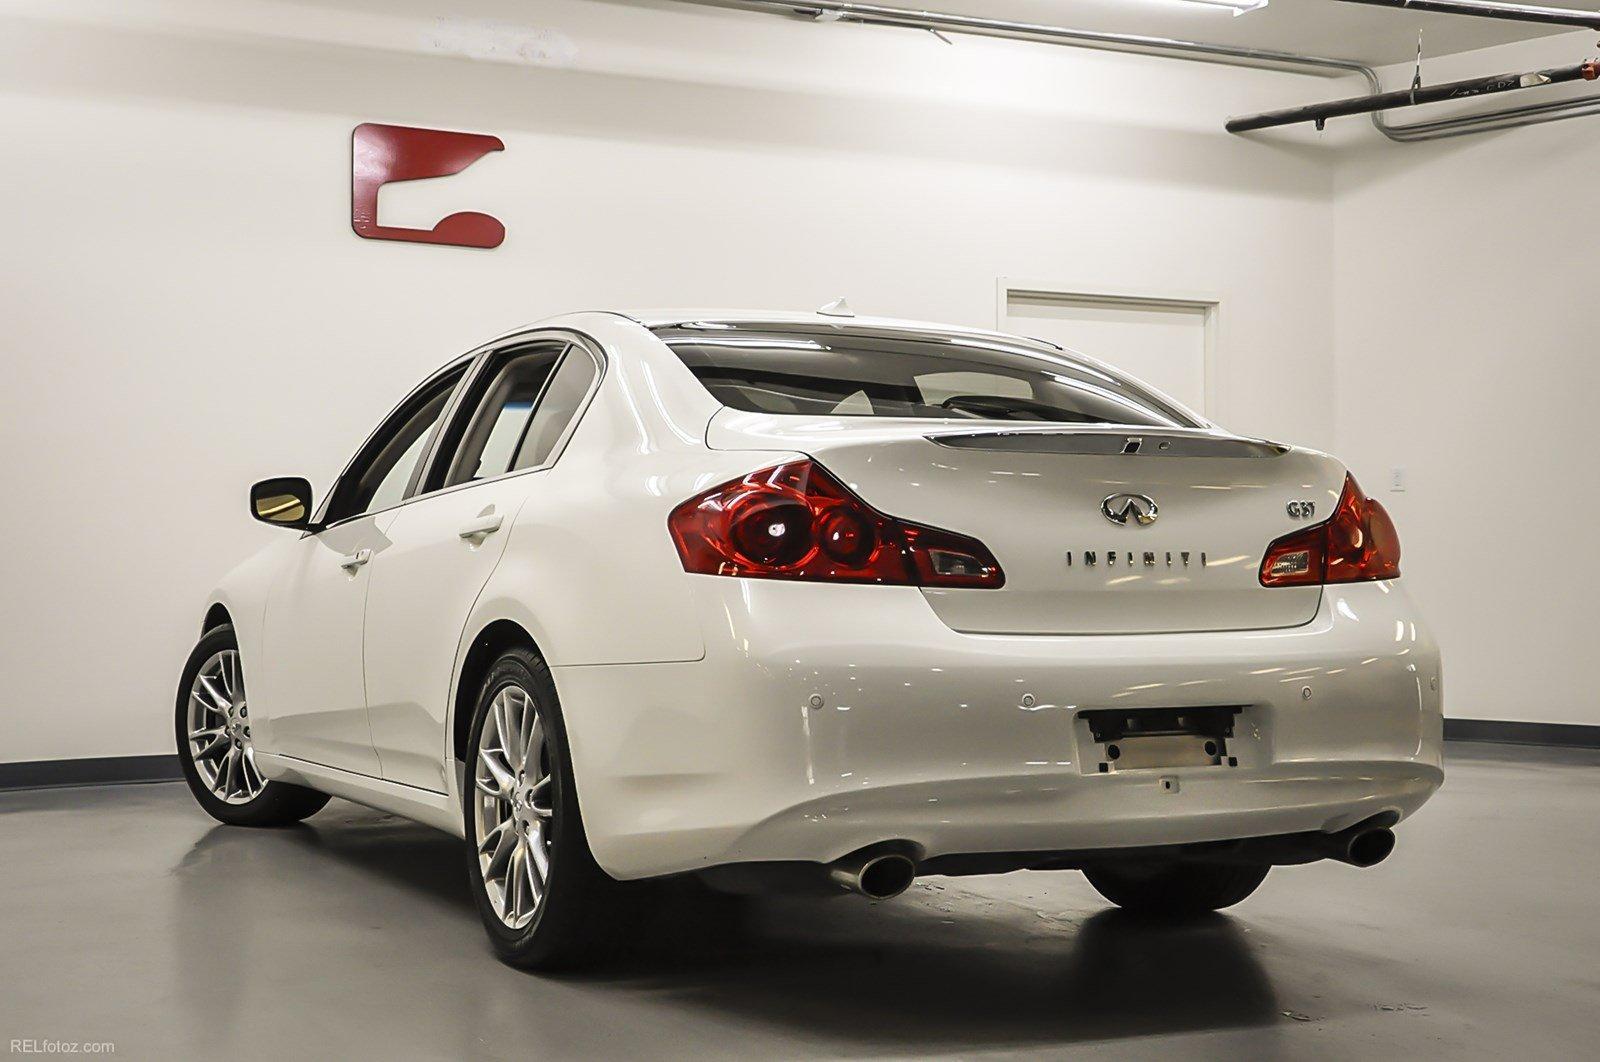 2012 Infiniti G37 Sedan Journey Stock 623476 For Sale Near Marietta Ga Ga Infiniti Dealer